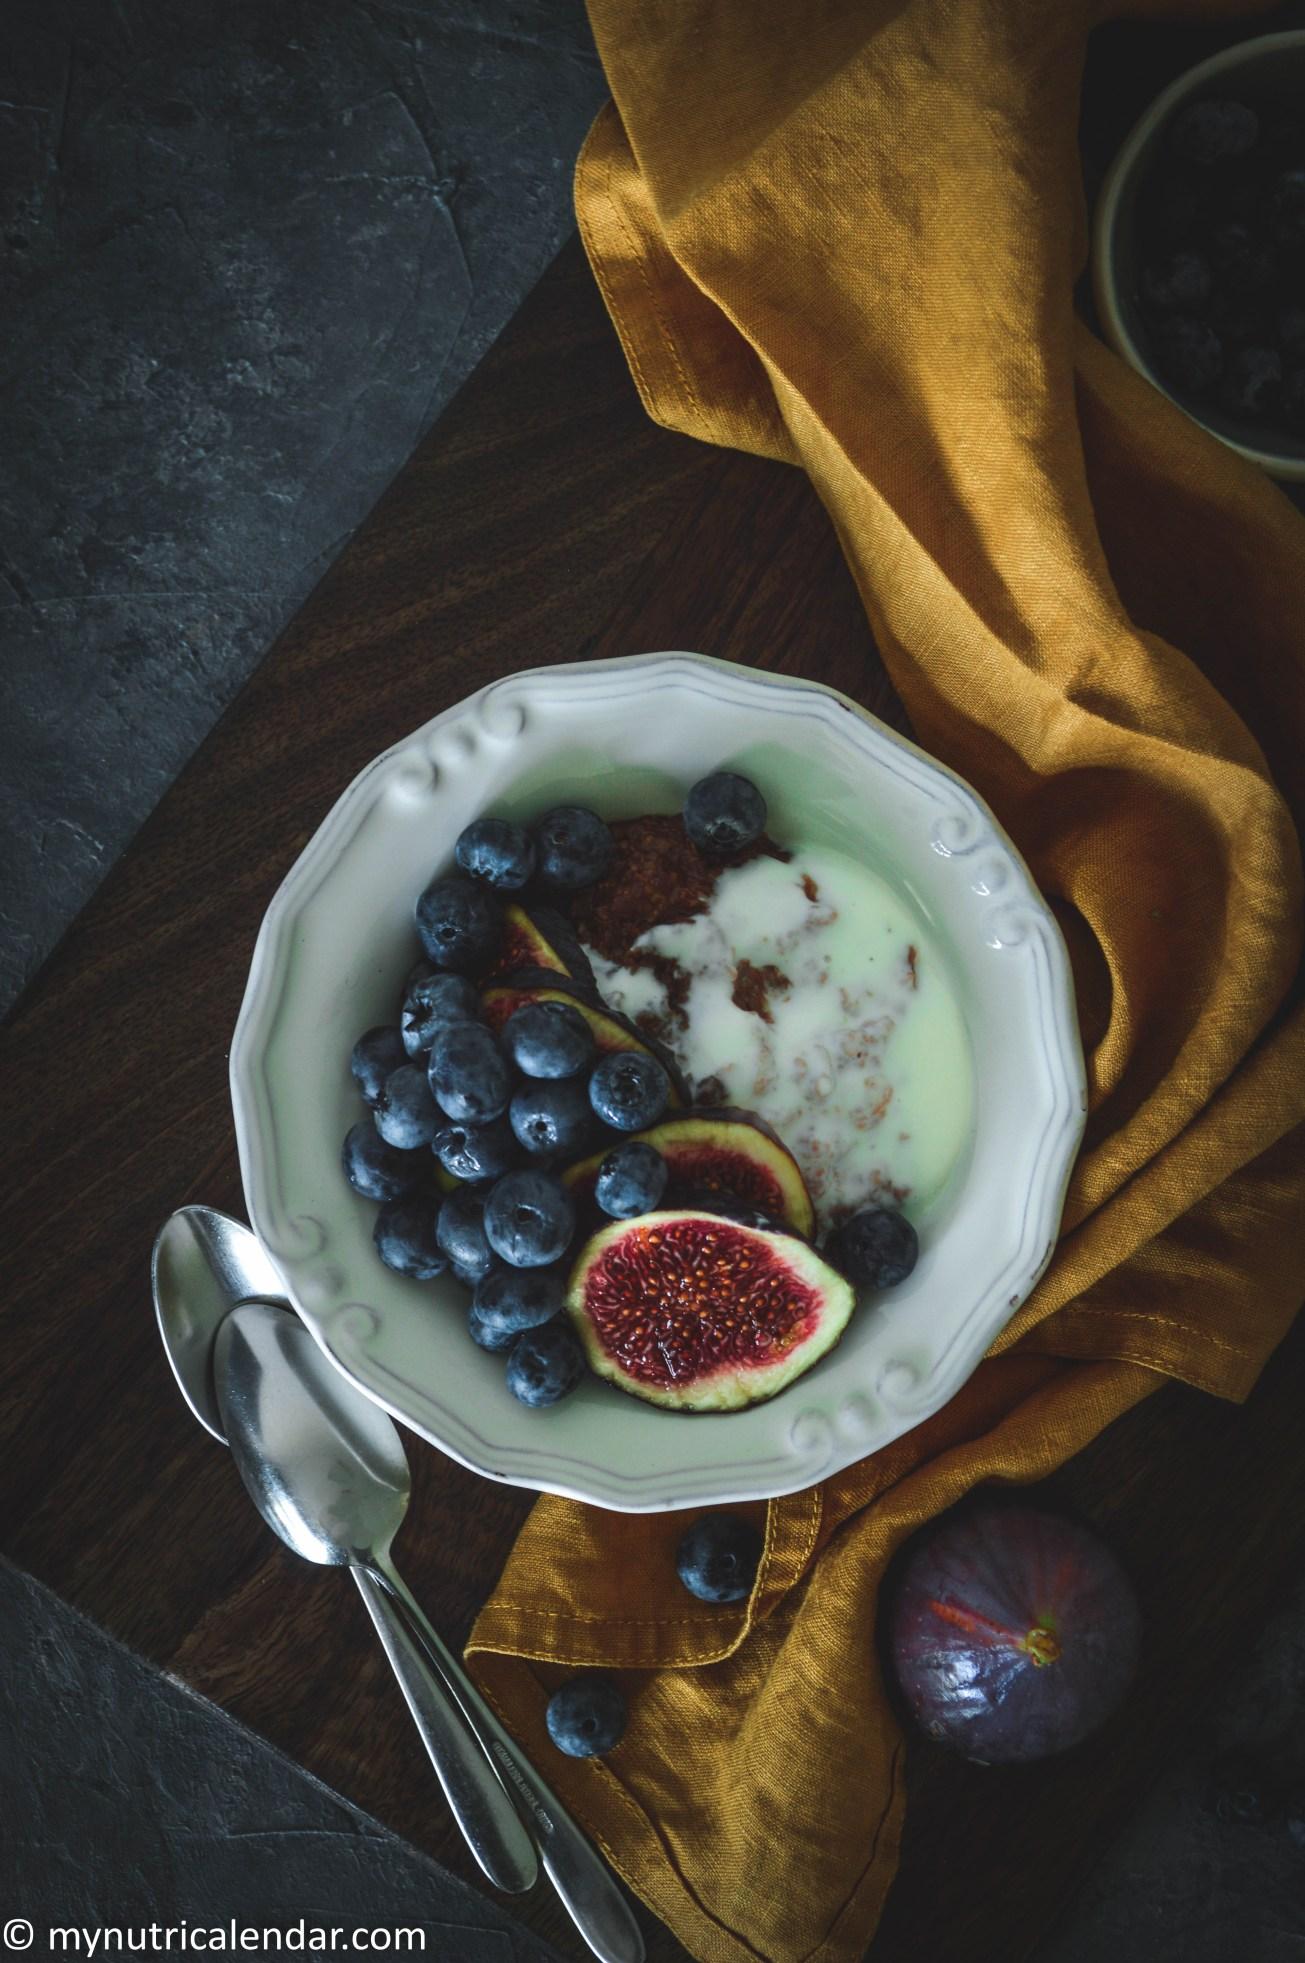 chocolate-oats-porridge-vanilla-soy-yogurt-blueberries-figs-toppings-food-photography-σοκολάτα-χυλός-βρώμης-γιαούρτι-βανίλια-μύρτιλα-σύκα